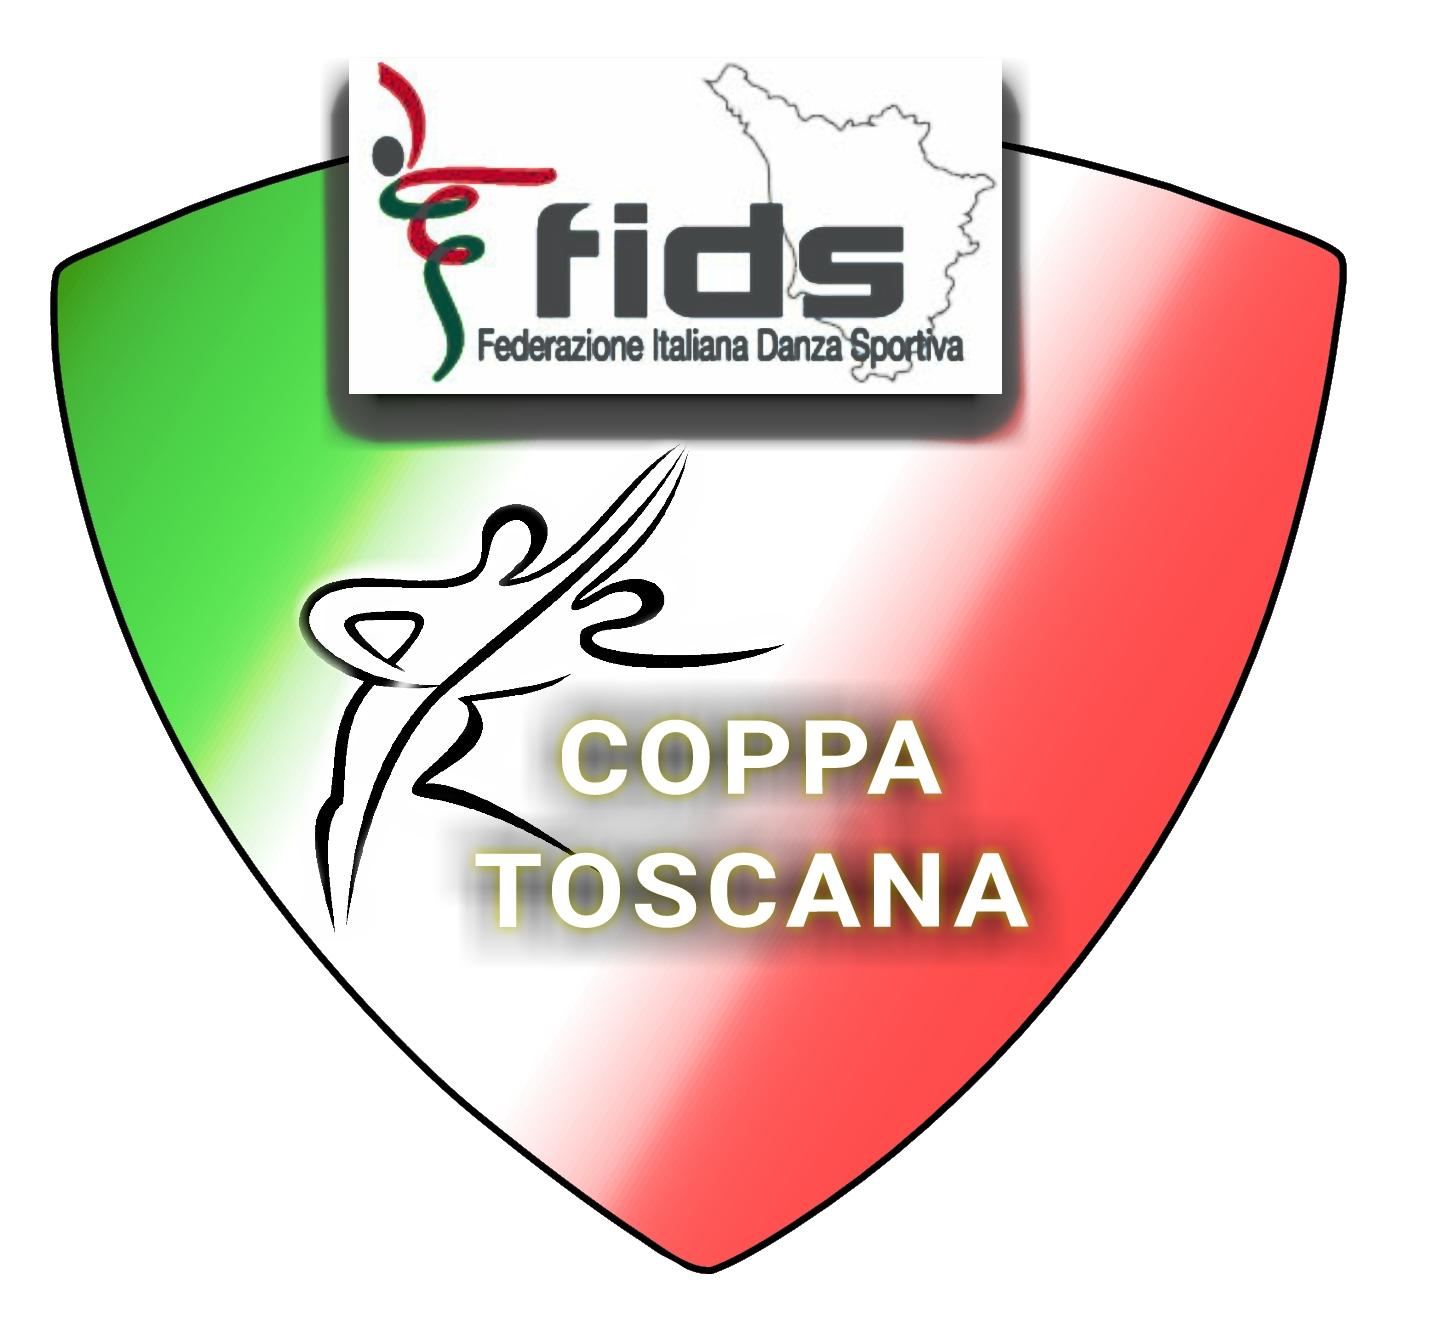 2° Coppa Toscana